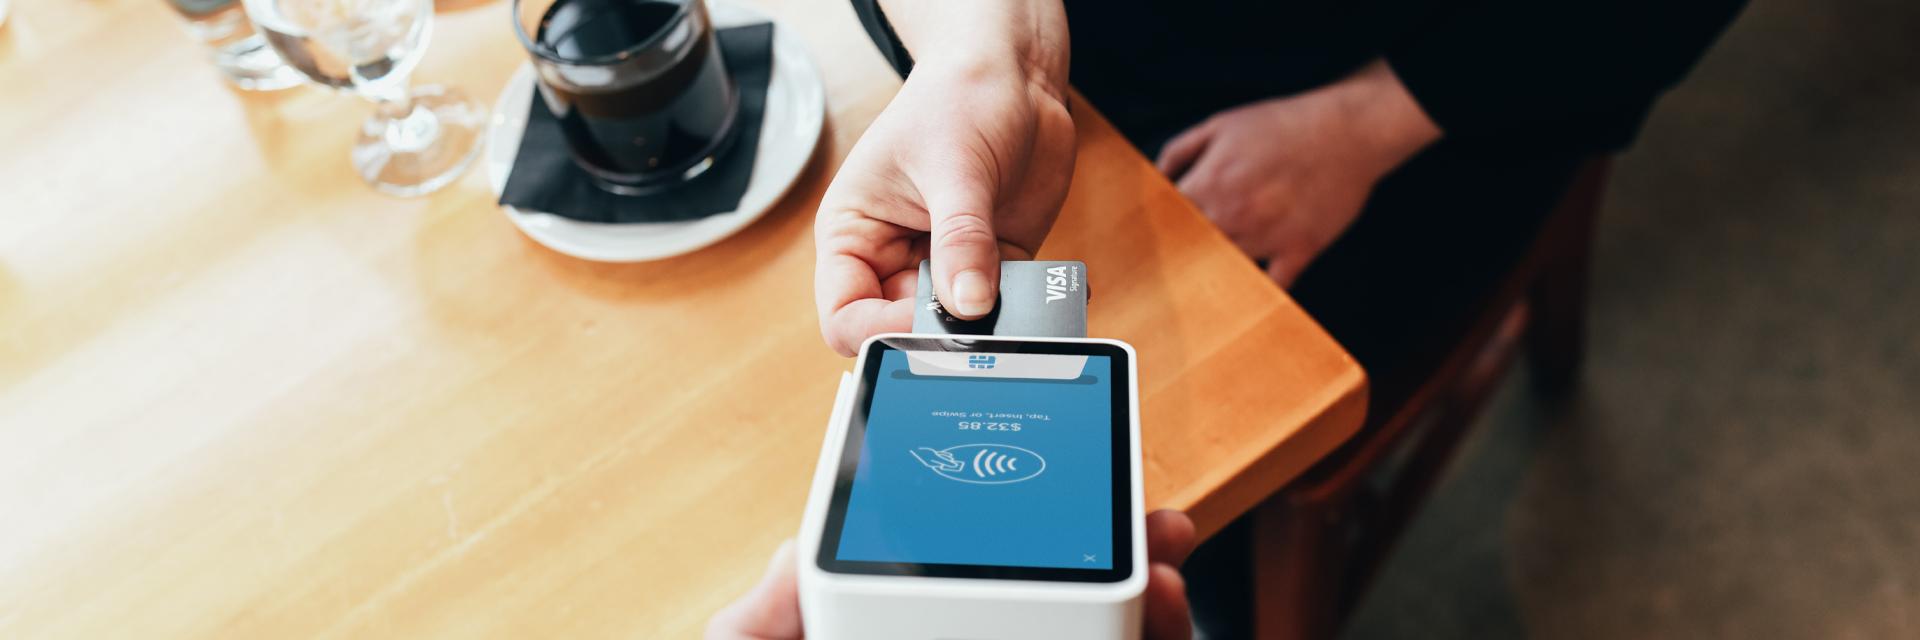 woman using a visa credit card at the coffee shop